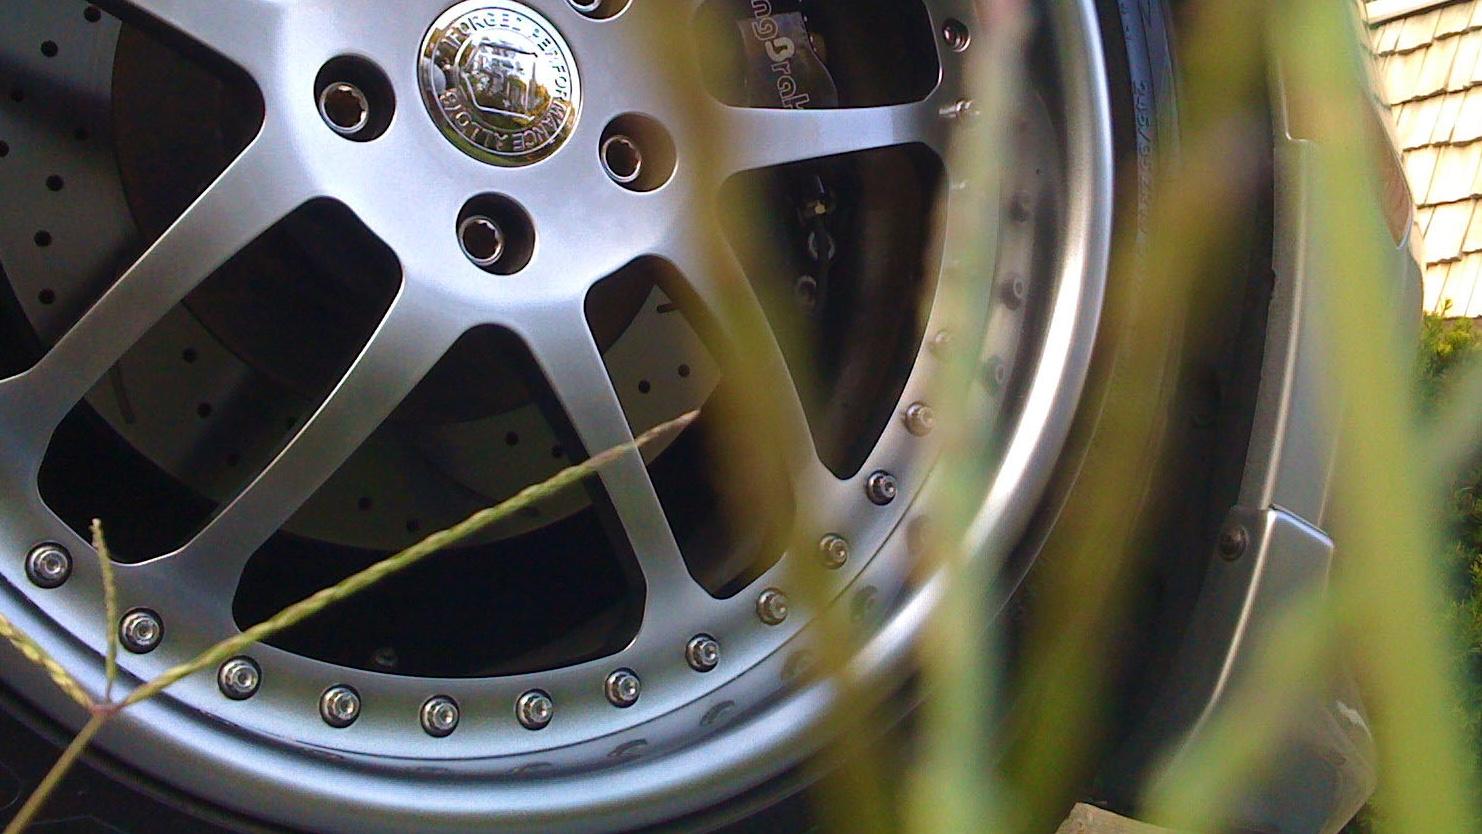 Wheels and brake 2.jpg